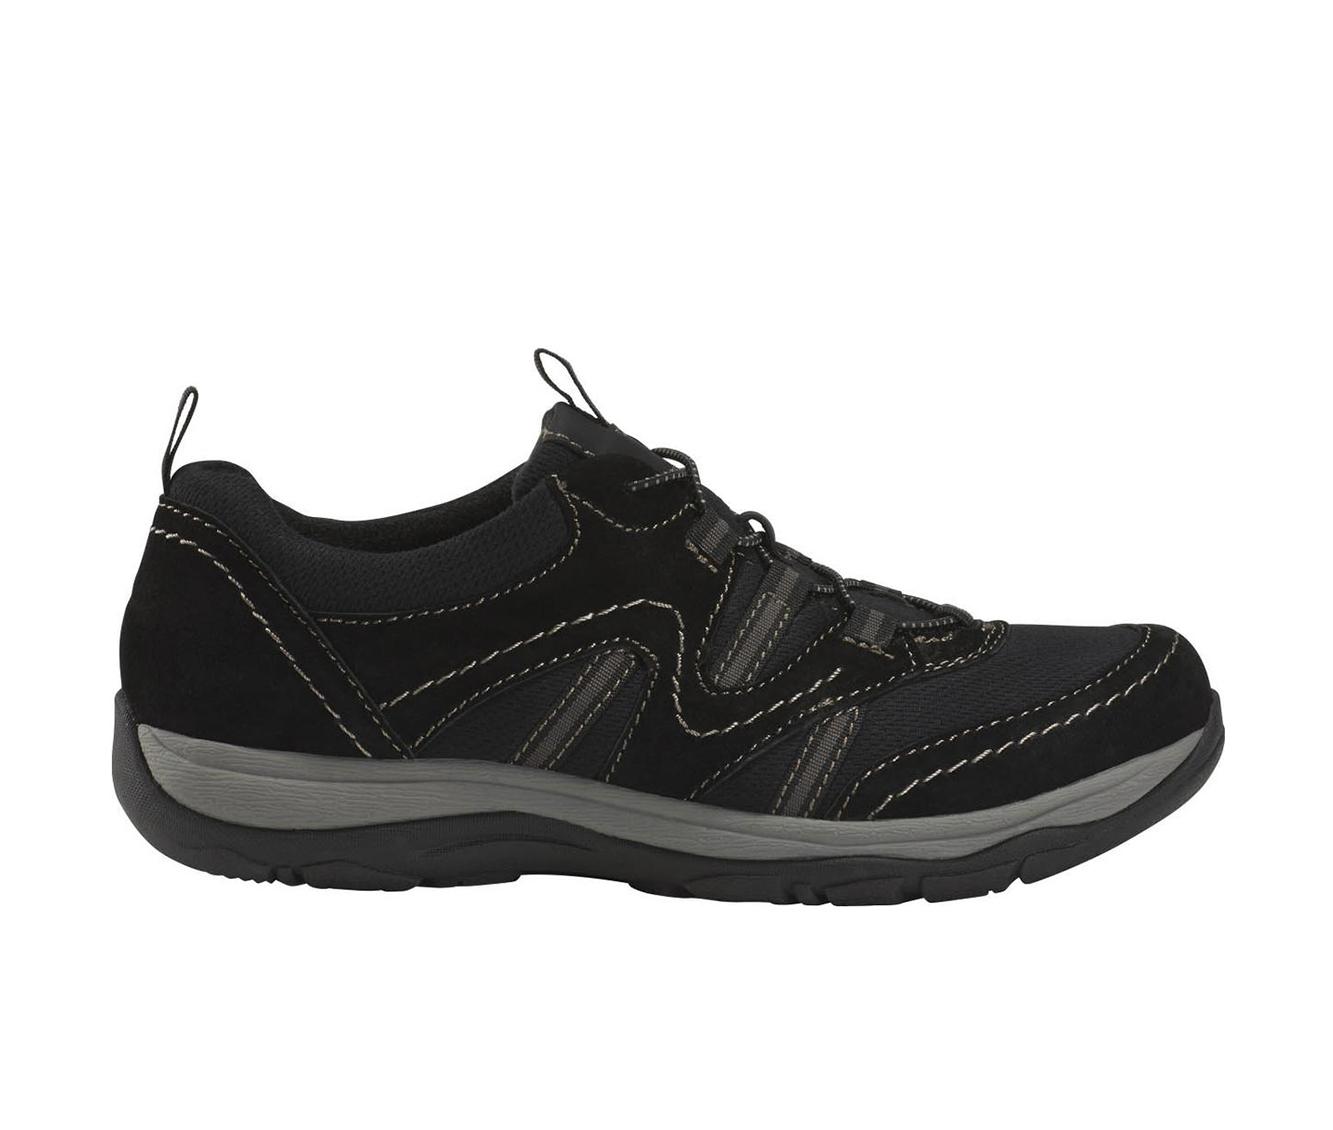 Earth Origins Luci Landon Women's Shoe (Black Suede)